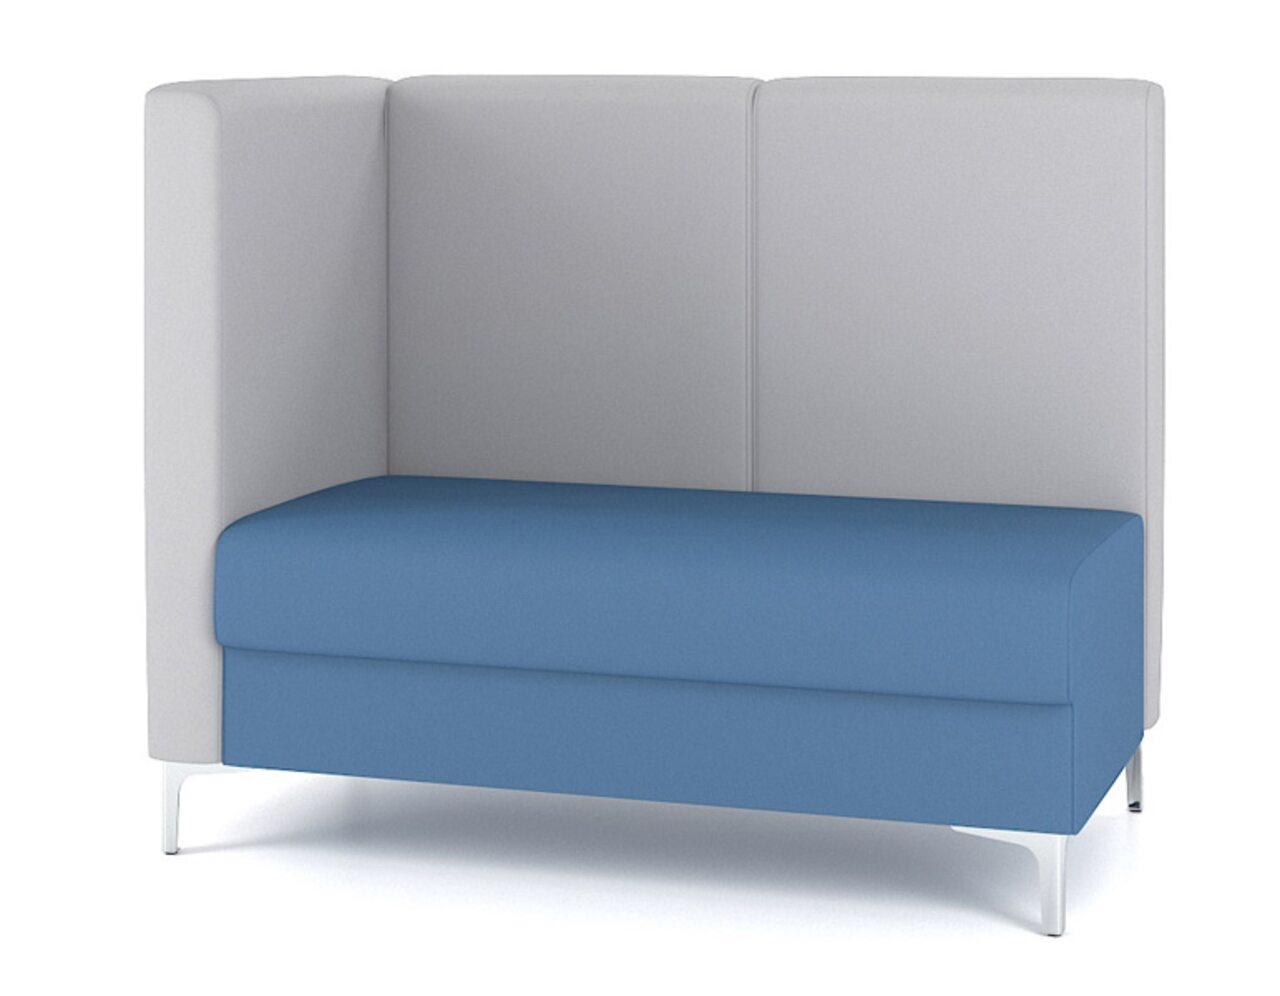 СекцияM6-2D2L (2D2R)  М6 Soft room 122x70x101 - фото 1